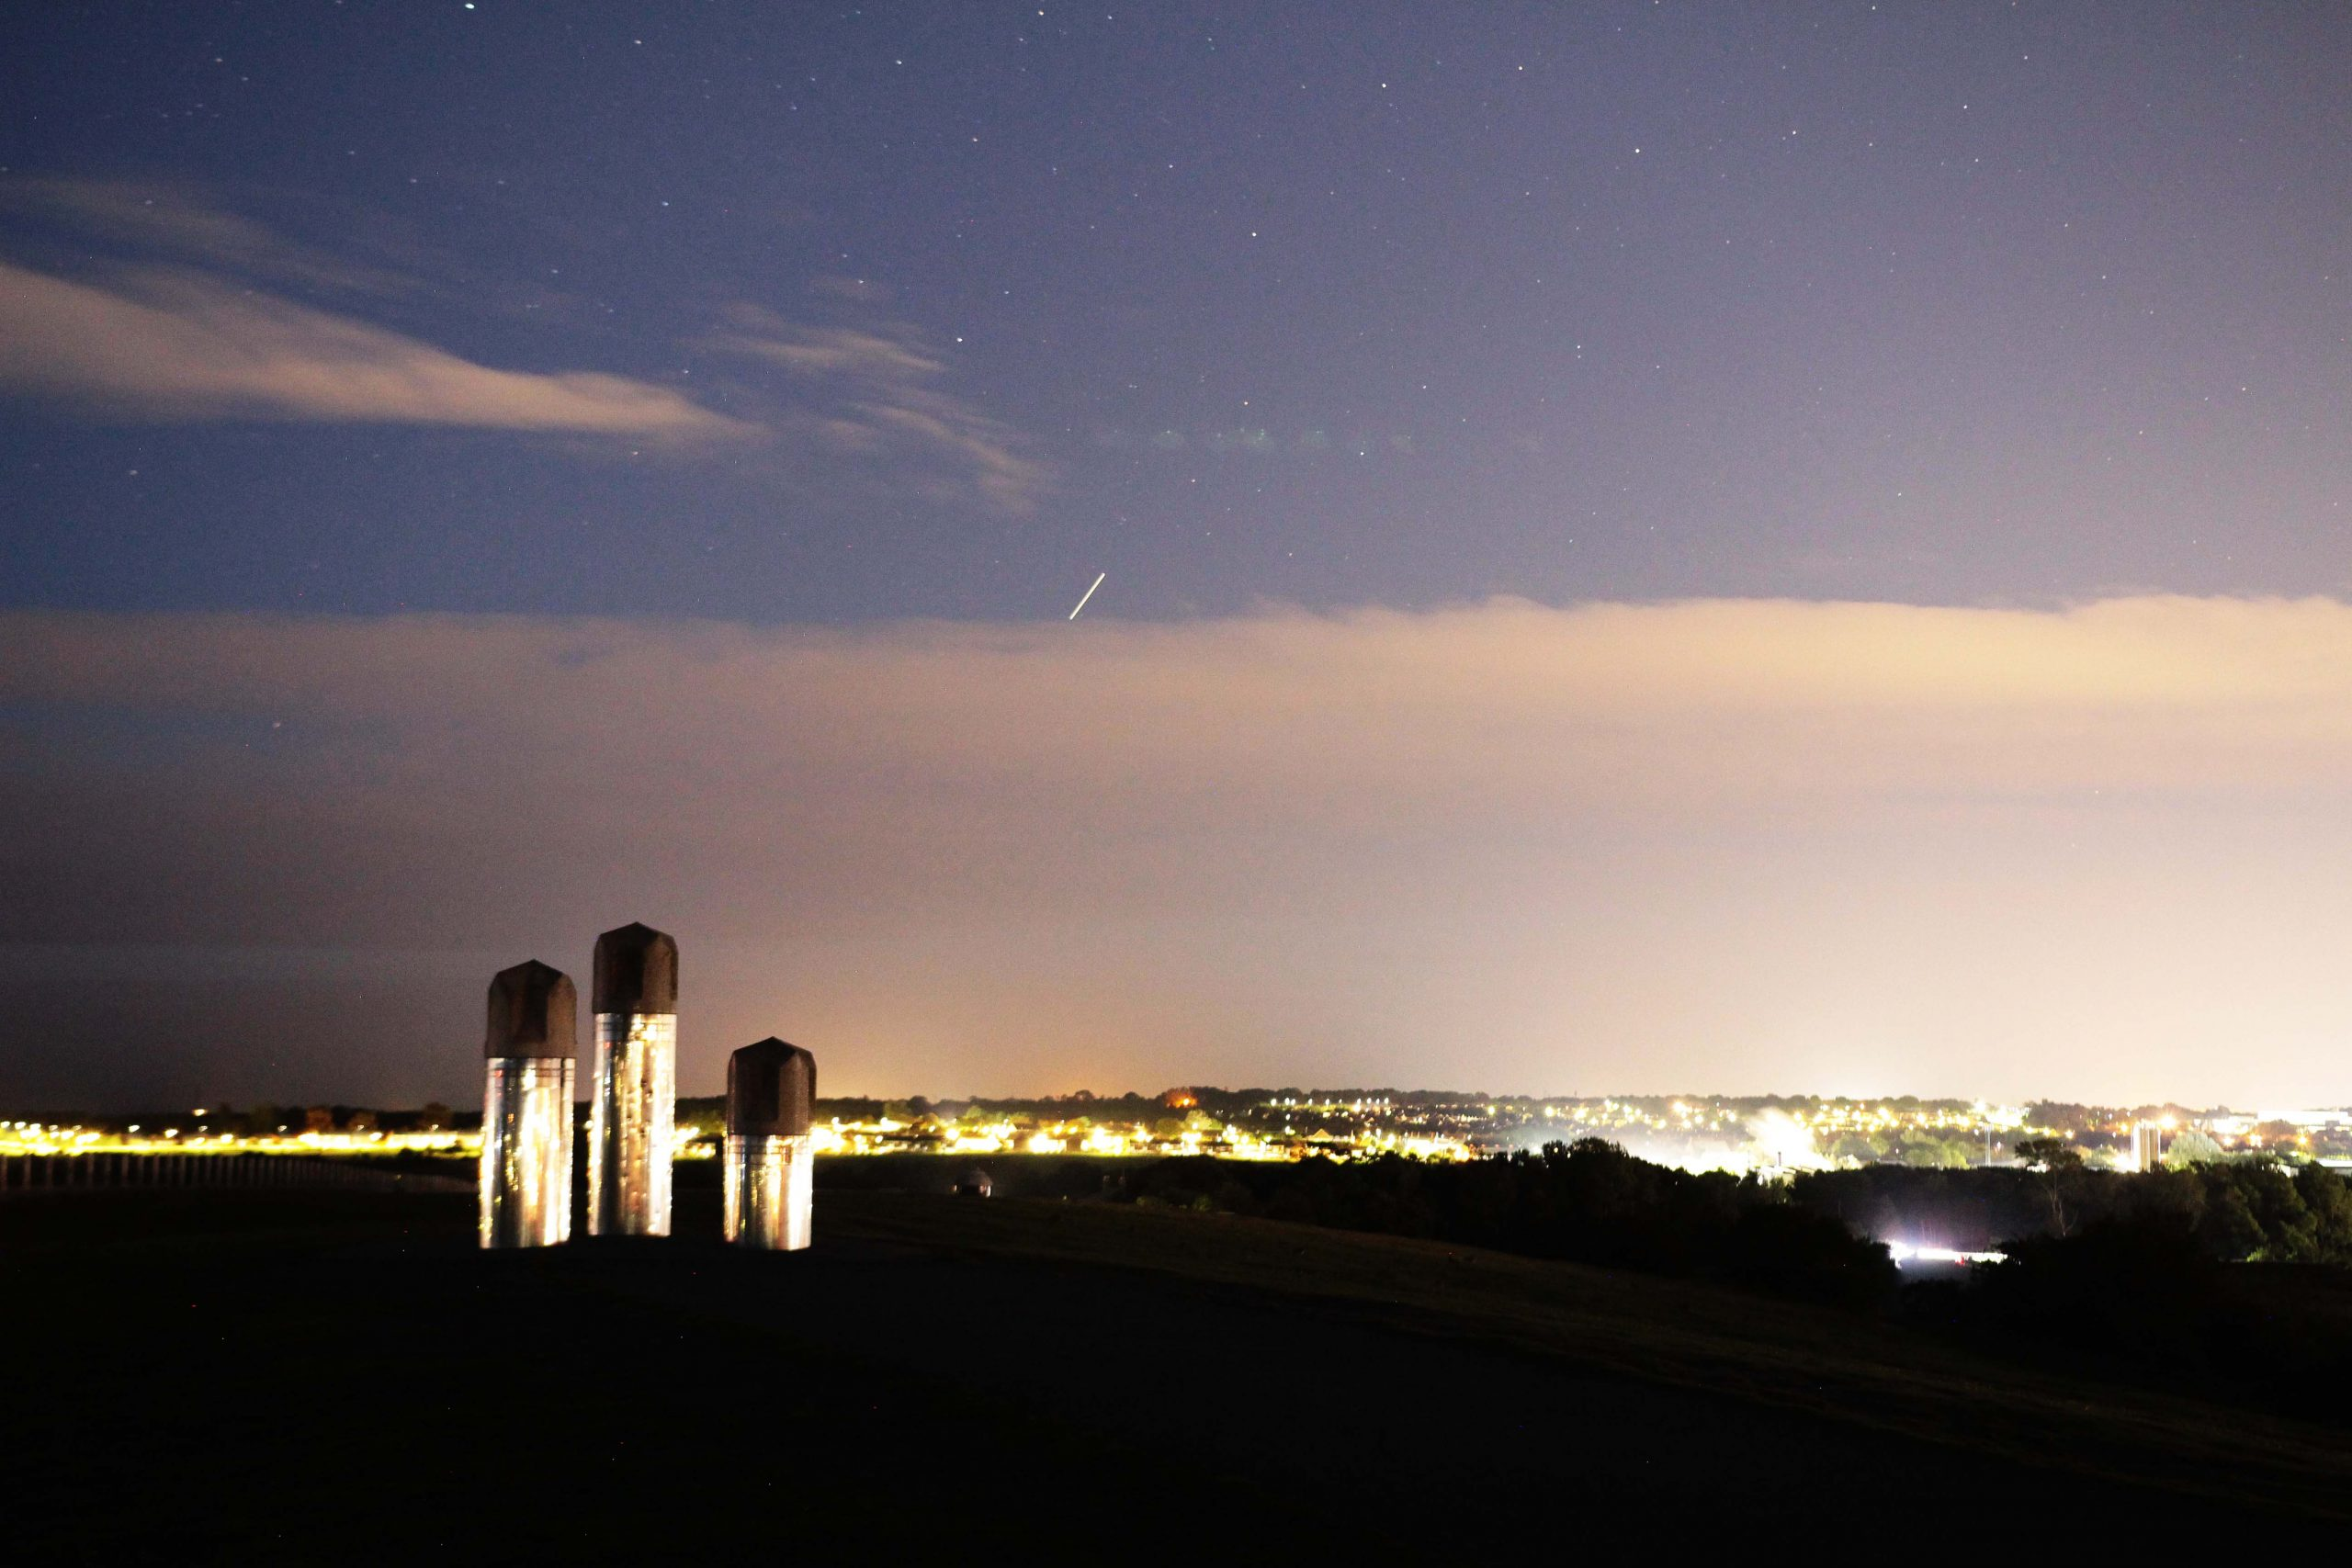 Weetslade at night